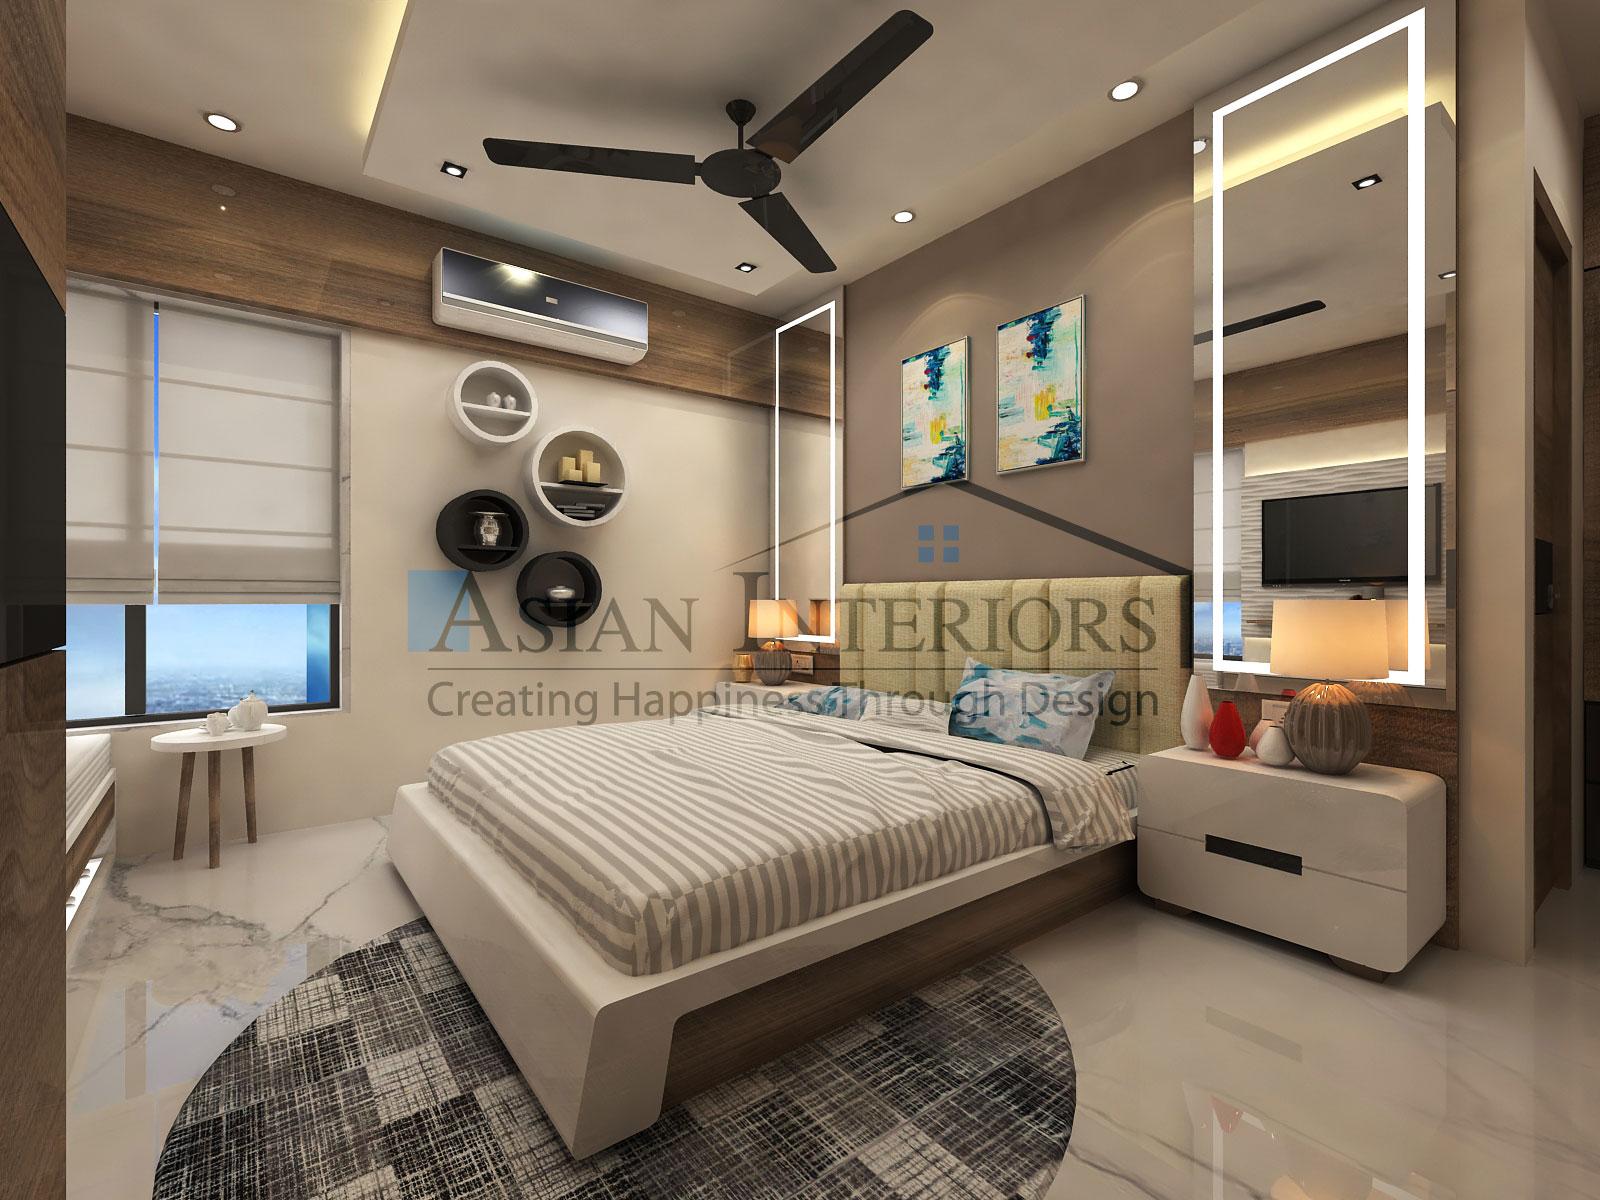 Asian-Interiors-BedRoom11